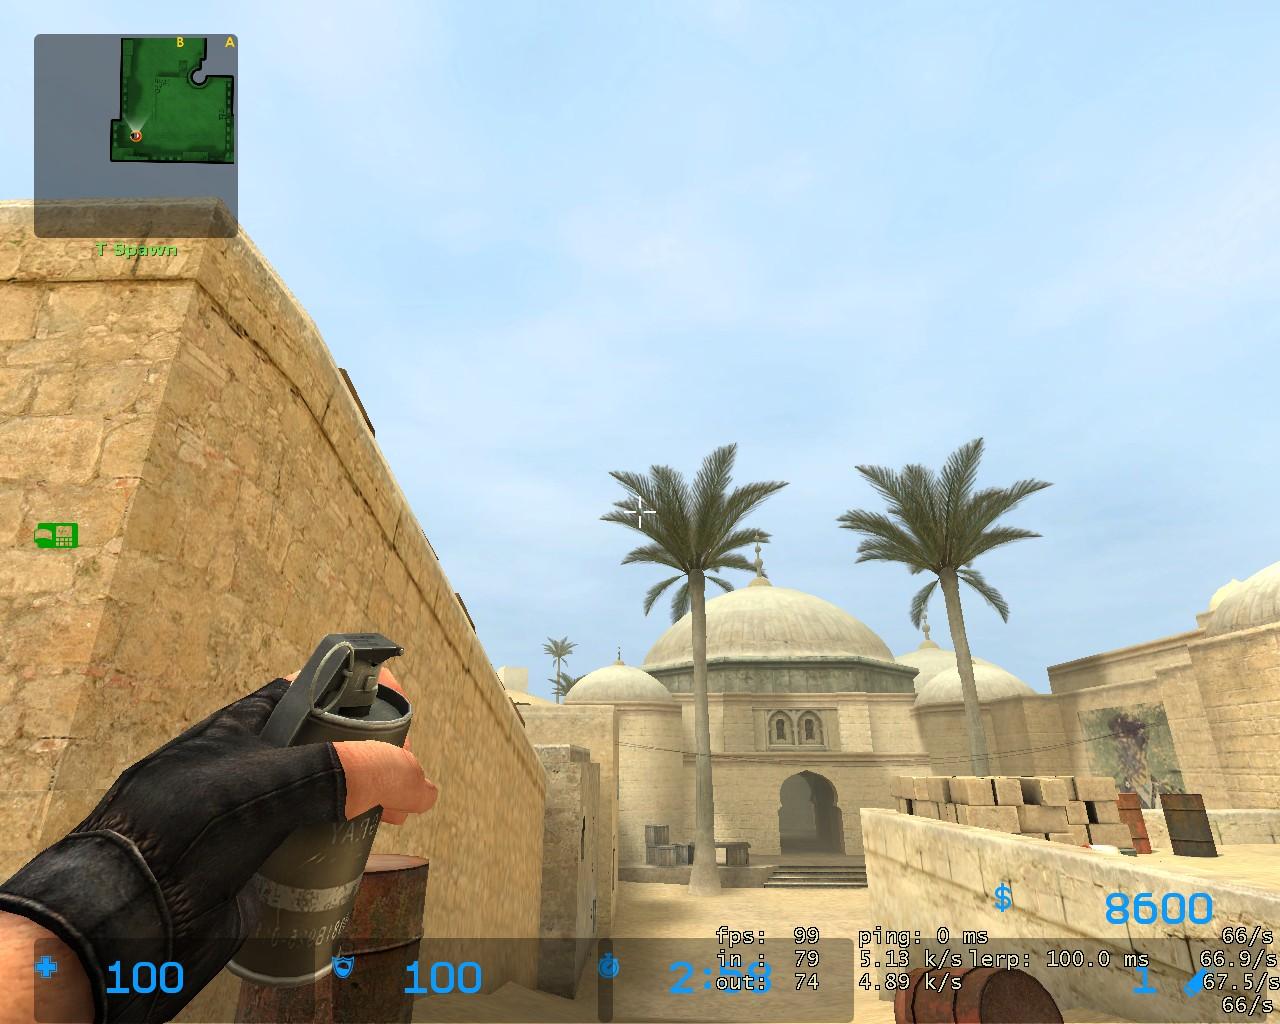 New BF2-de_dust2-spawn-plat-smoke-jpg